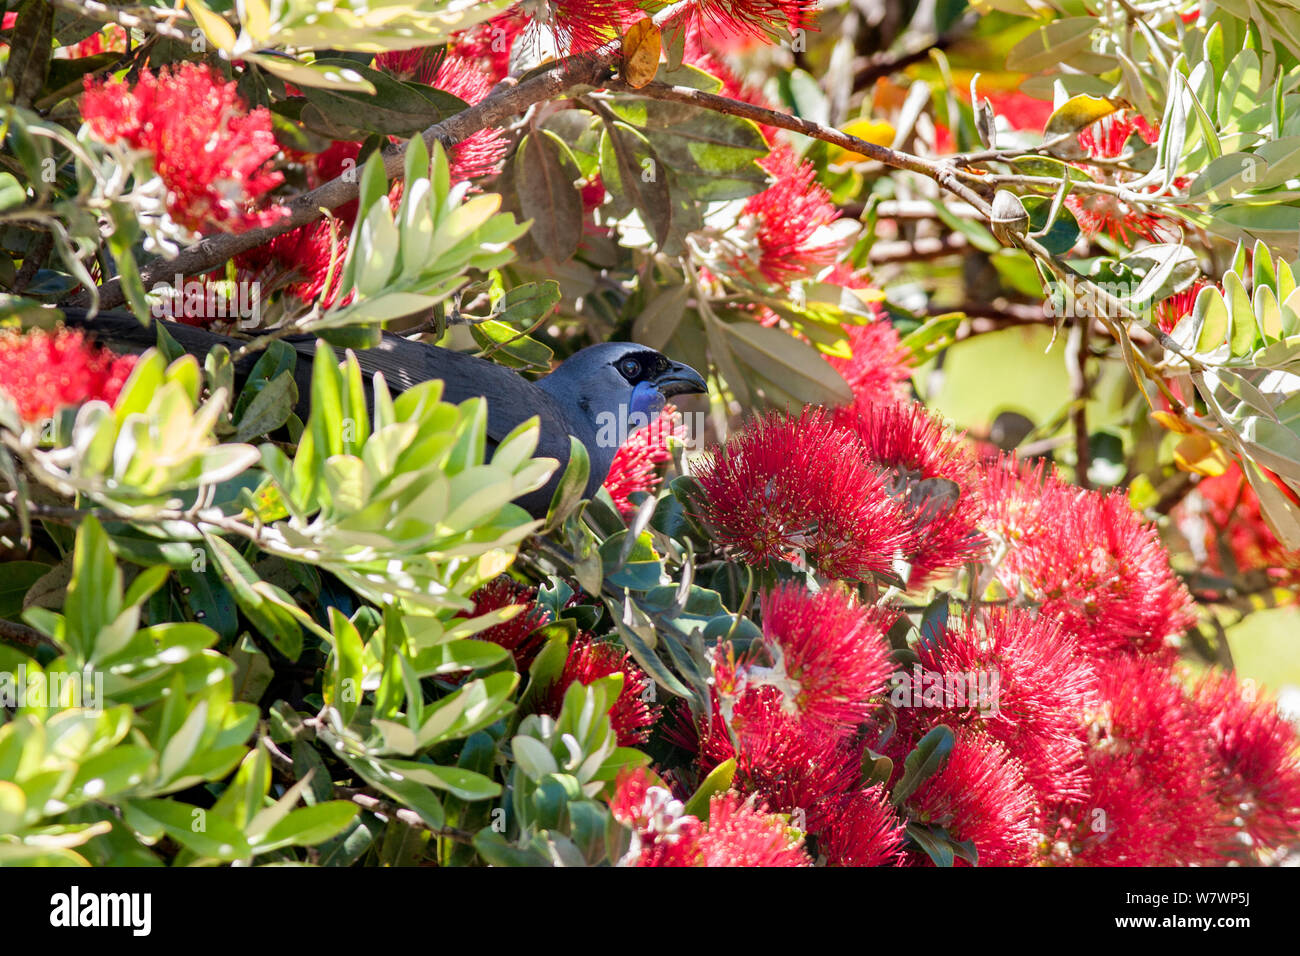 Adult kokako (Callaeas wilsoni) perched in a flowering Pohutukawa tree (Metrosideros excelsa) and feeding on nectar. Tiritiri Matangi Island, Auckland, New Zealand, December. Endangered species. Stock Photo